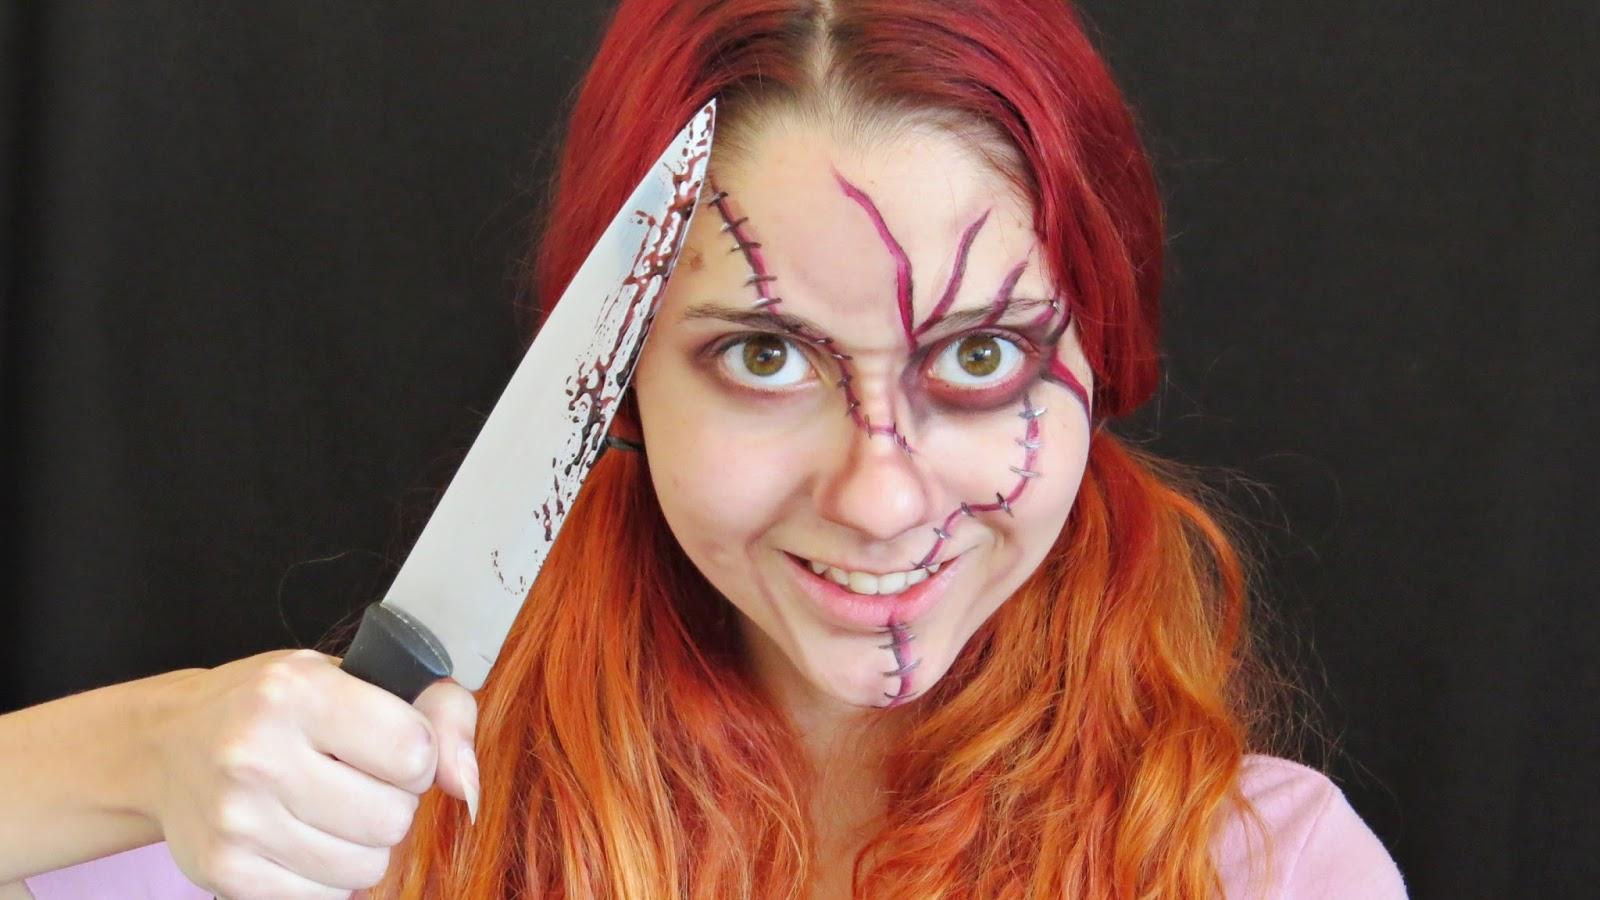 Jack Boneco Assassino Cool little b. | alternative fashion, d.i.y., beauty: makeup halloween